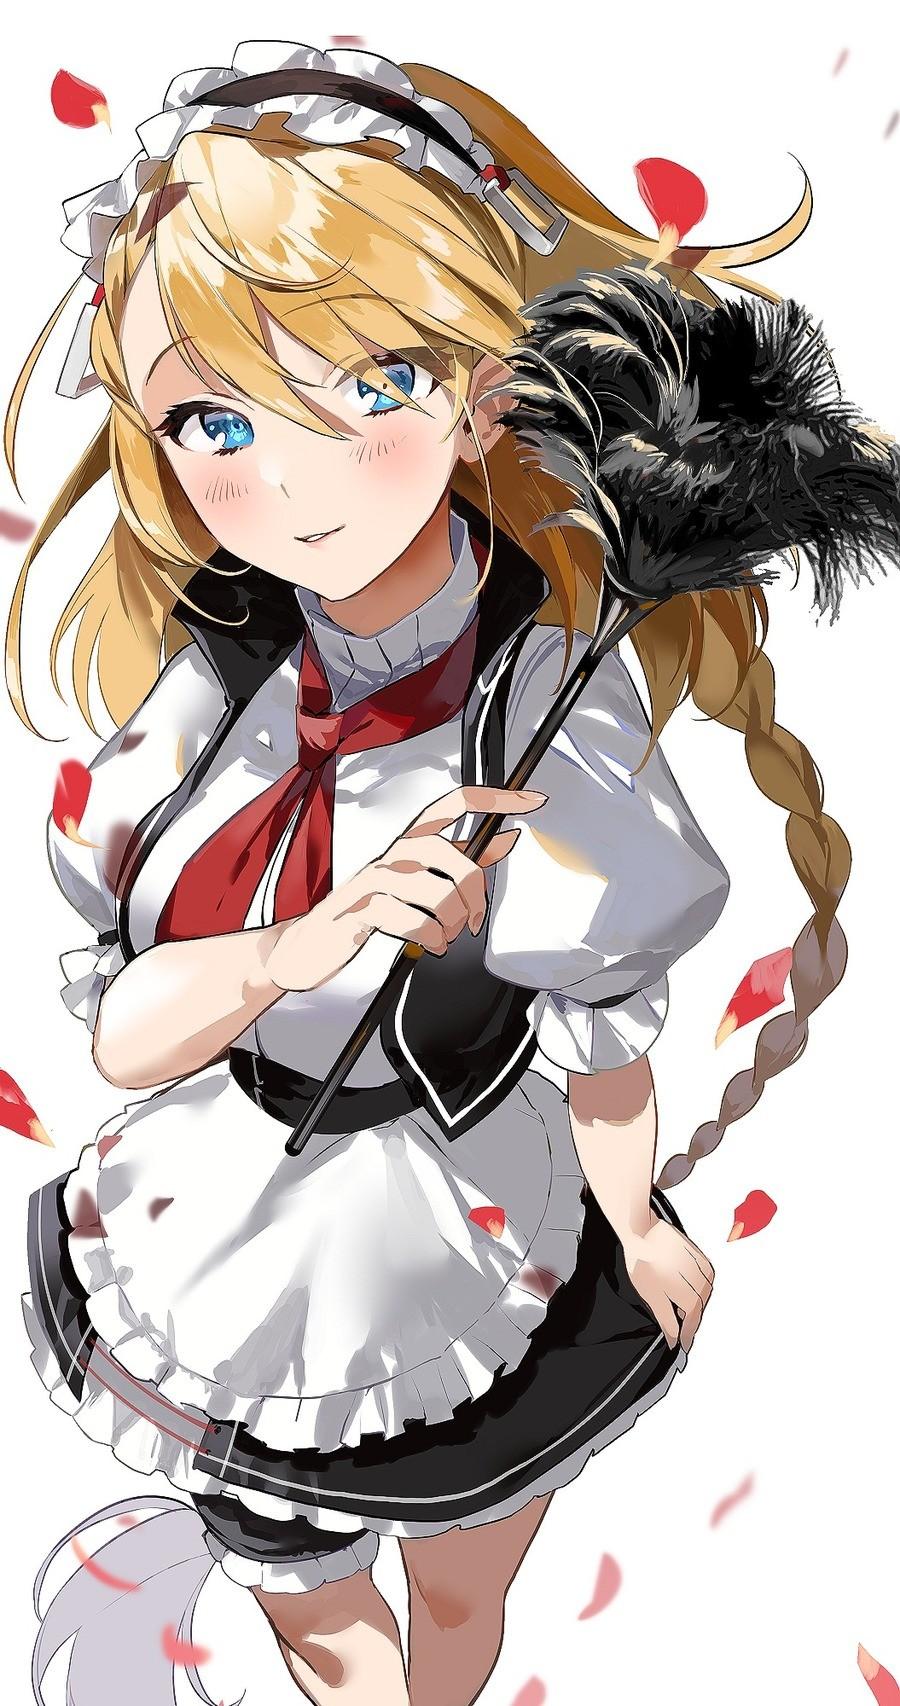 Maid March part 22. join list: SplendidServants (495 subs)Mention History join list:. German meido waifu.